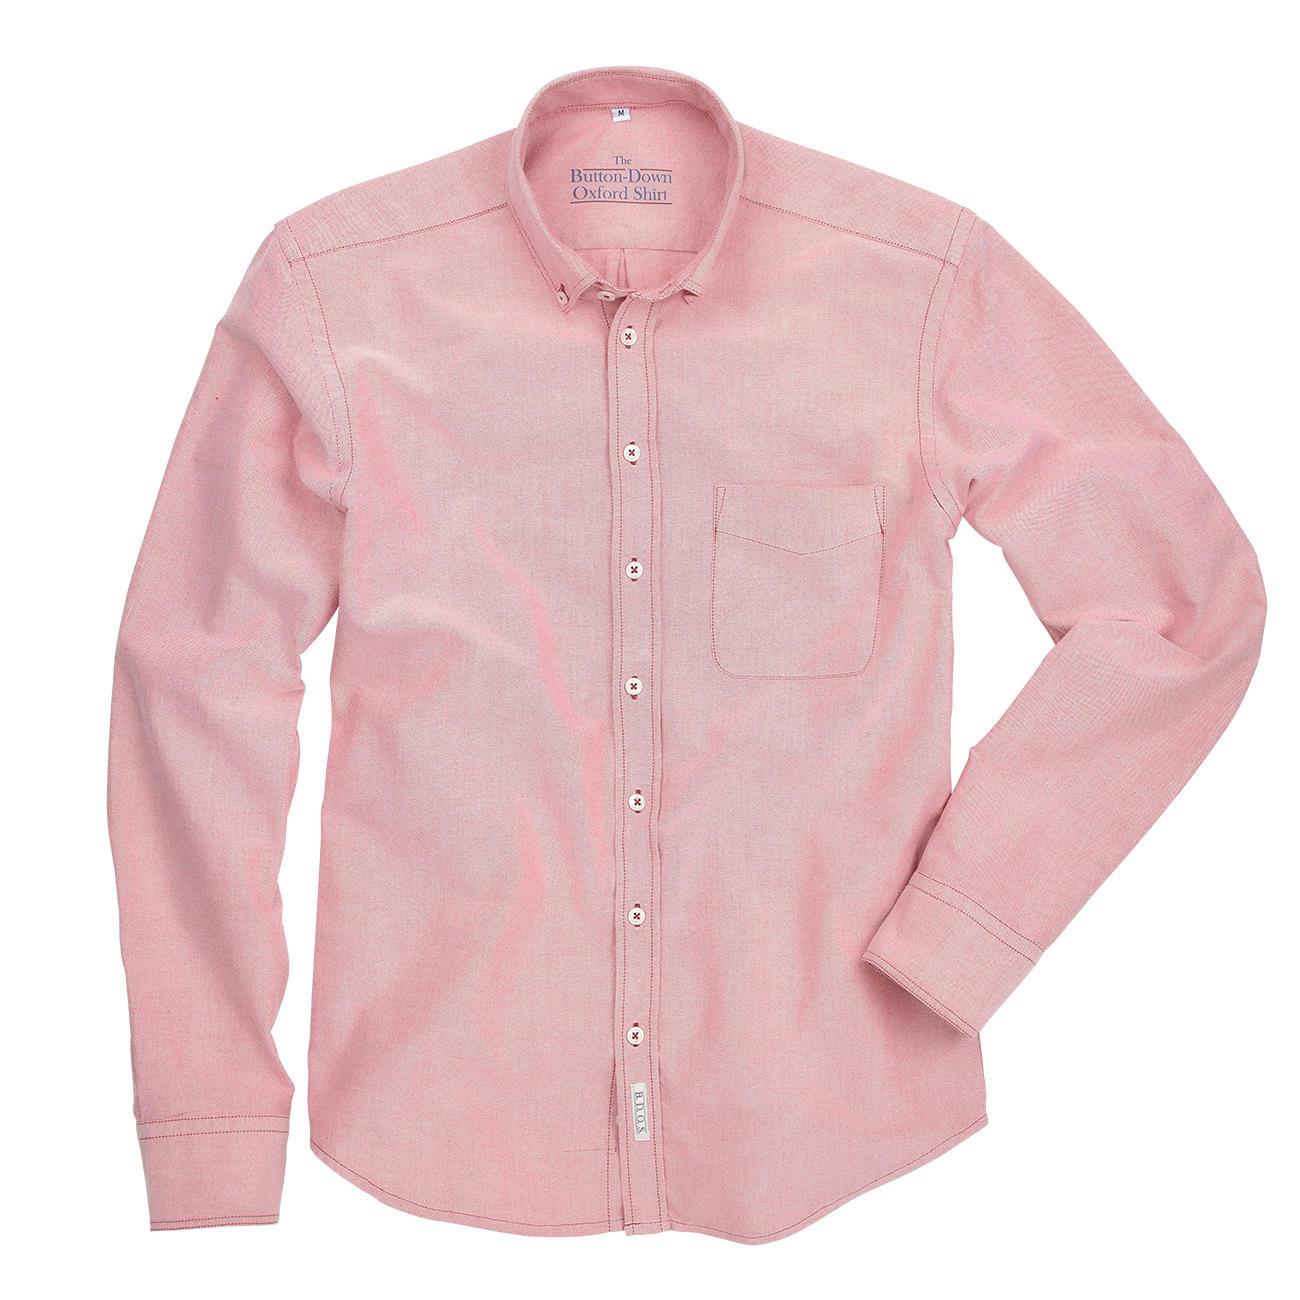 The BDO-Shirt, 38 cm - Rot - Slim Fit :: Rot - 38 cm -  - Erwachsene